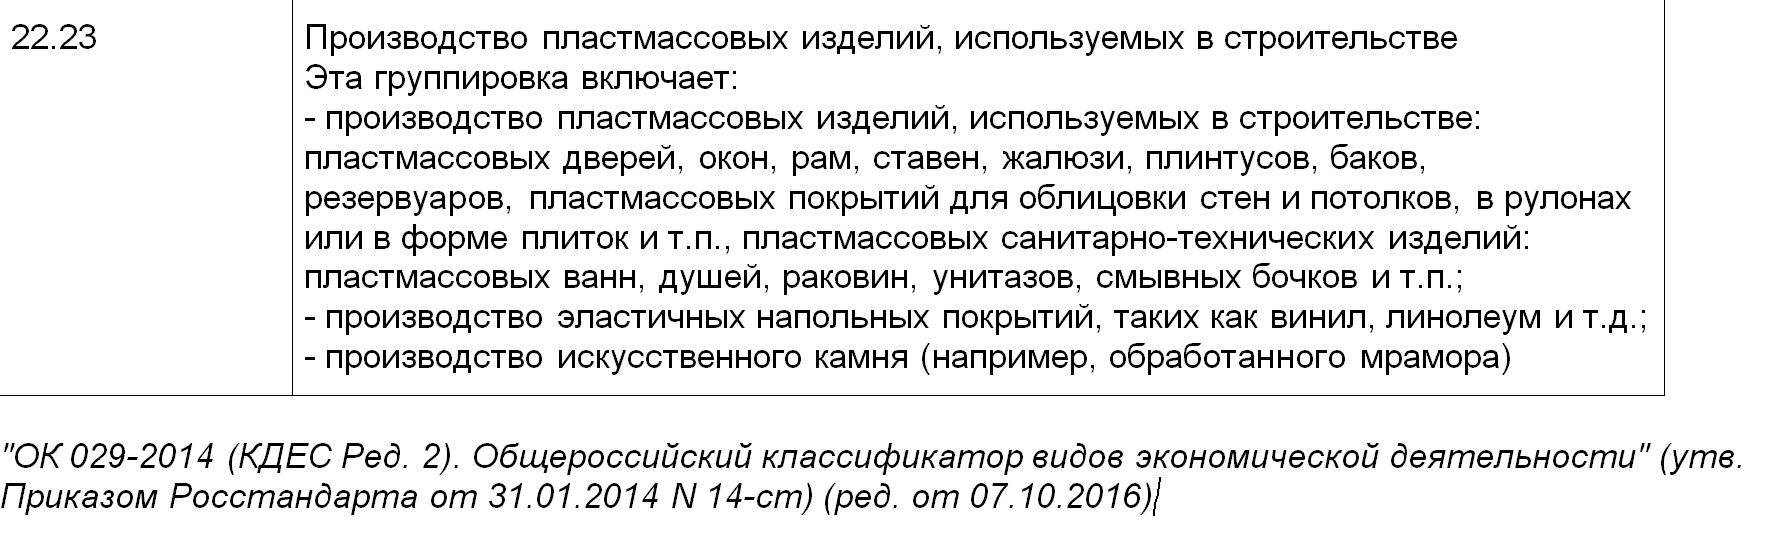 Расшифровка ОКВЭД 22.23